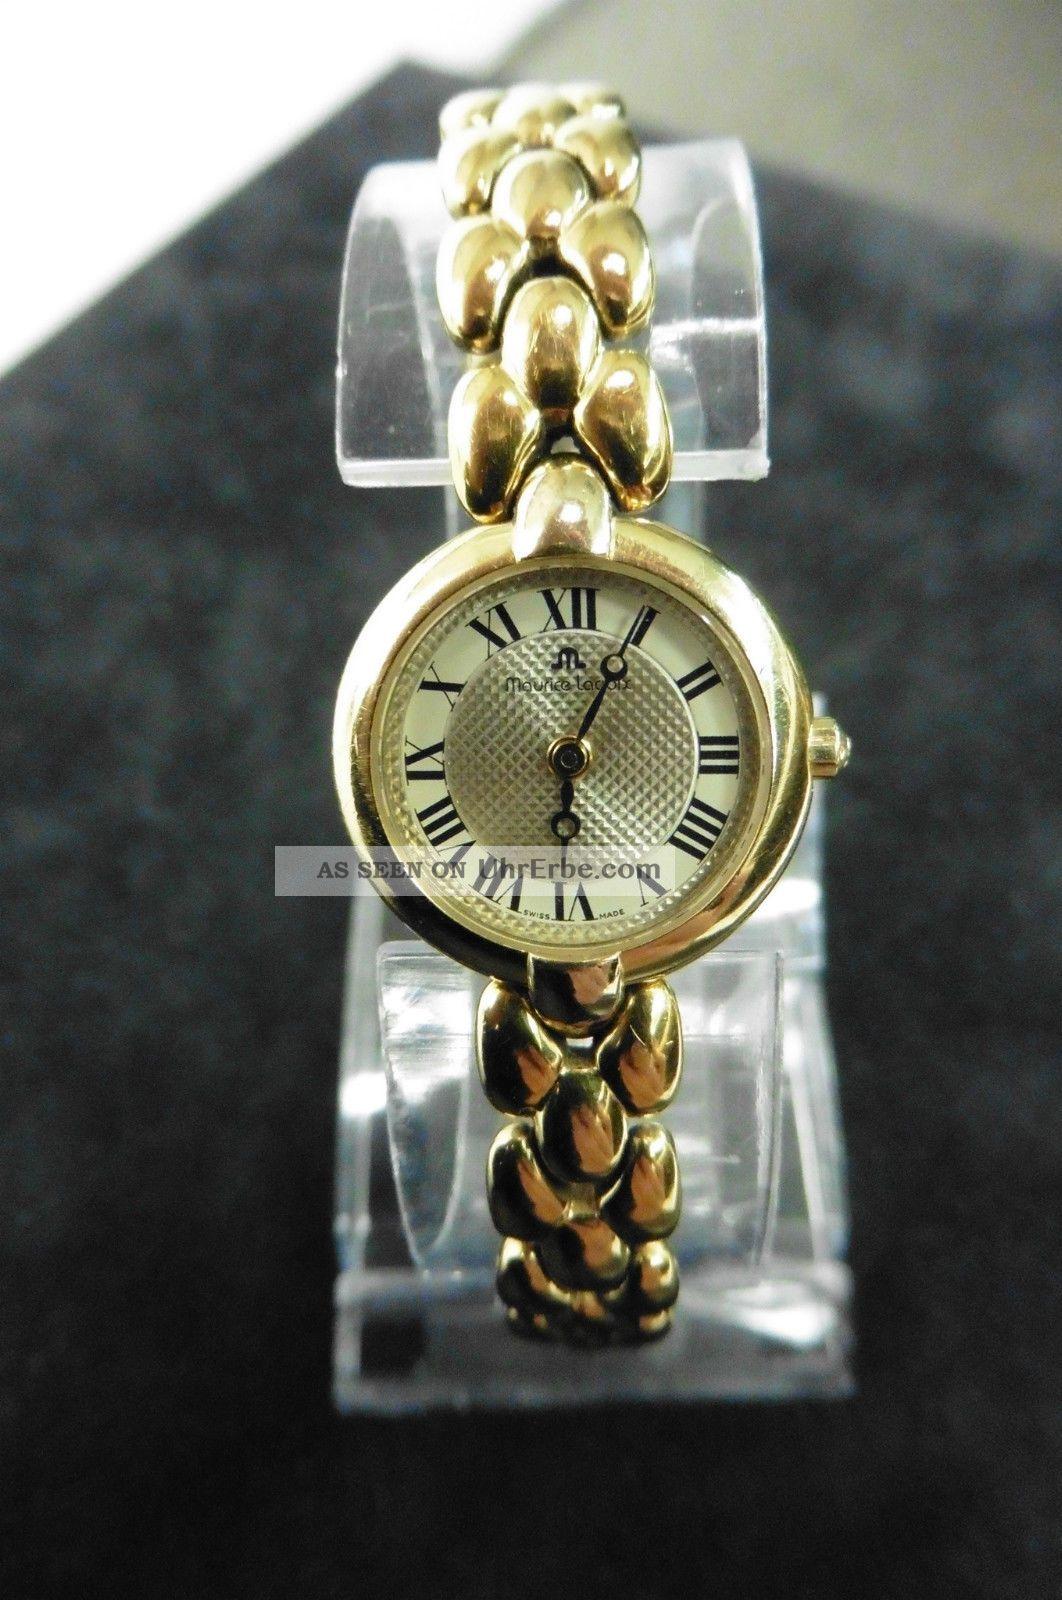 Maurice Lacroix Gold Dau Hau Damenuhr Luxus Klassisch Uhr Quarz Watch Vergoldet Armbanduhren Bild